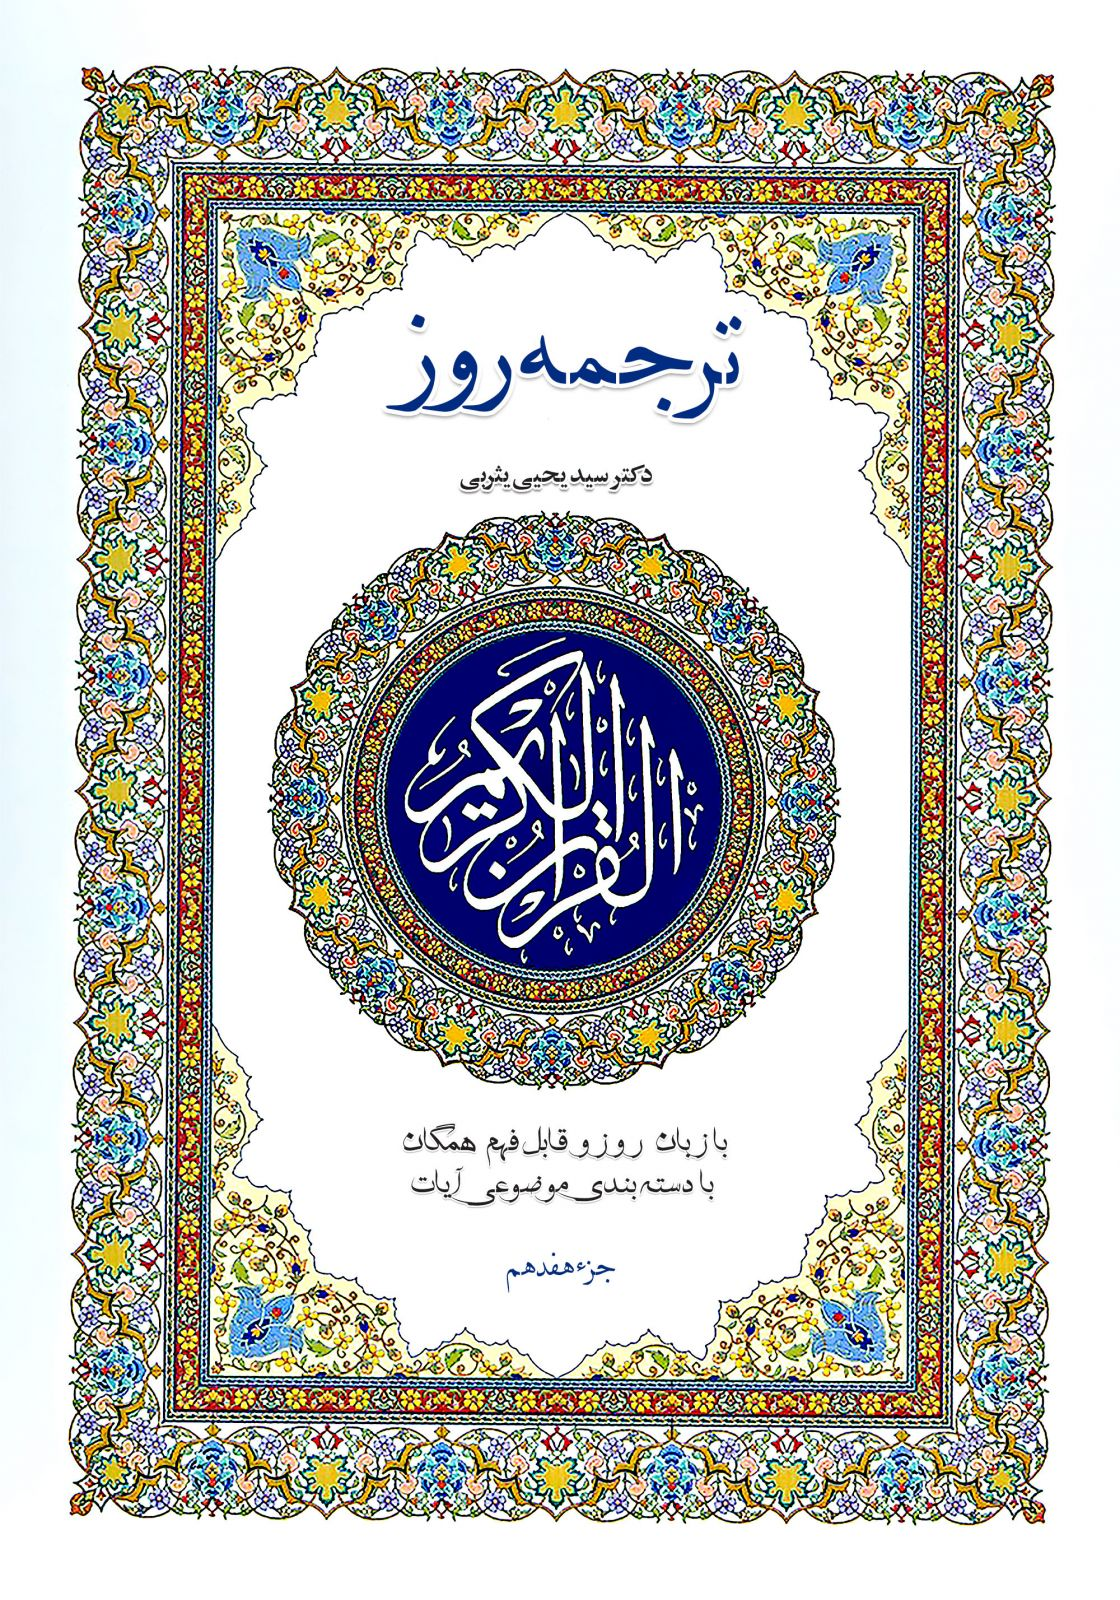 قرآن کریم (جزء هفدهم)